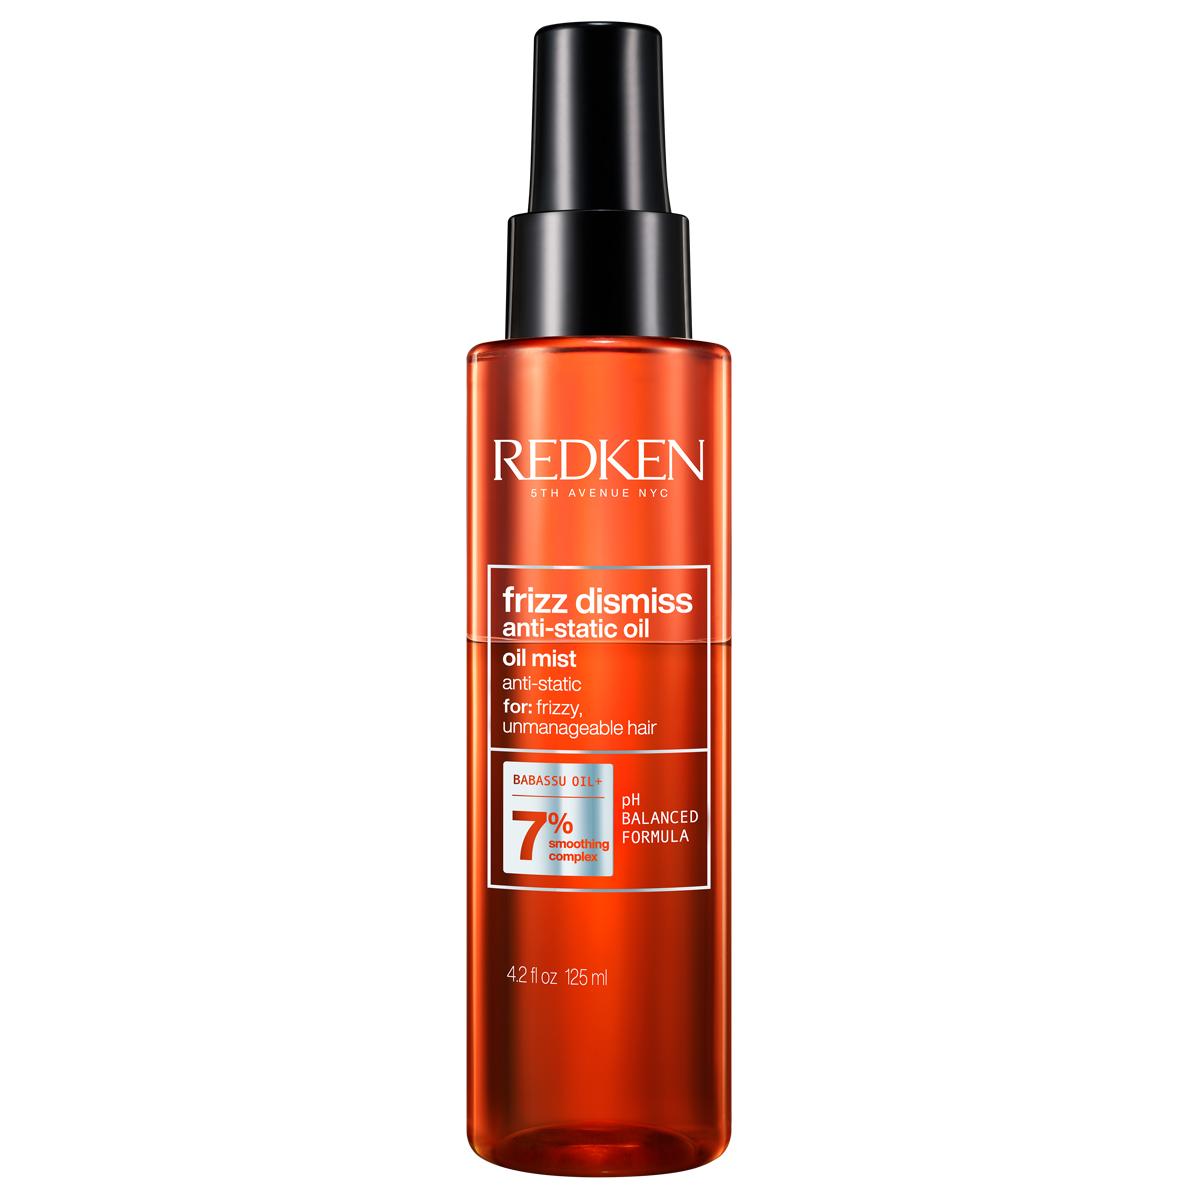 Redken Антистатик Масло-спрей, 125 мл (Redken, Уход за волосами)